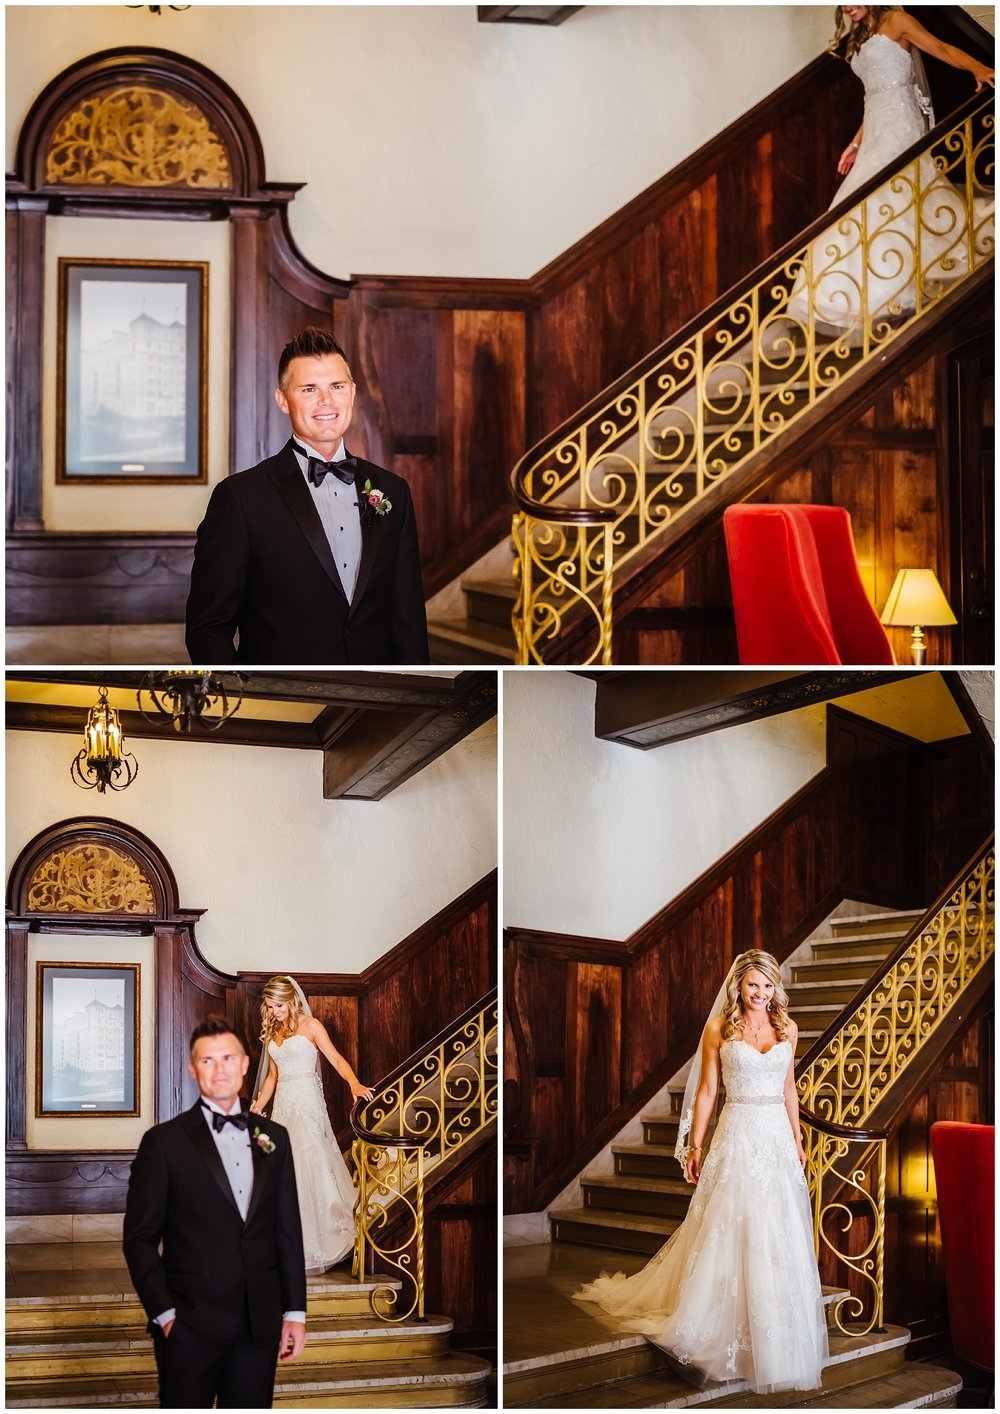 tampa-bradenton-wedding-photographer-south-florida-museum-classic-blush-gold-alpacas-sparklers_0023.jpg